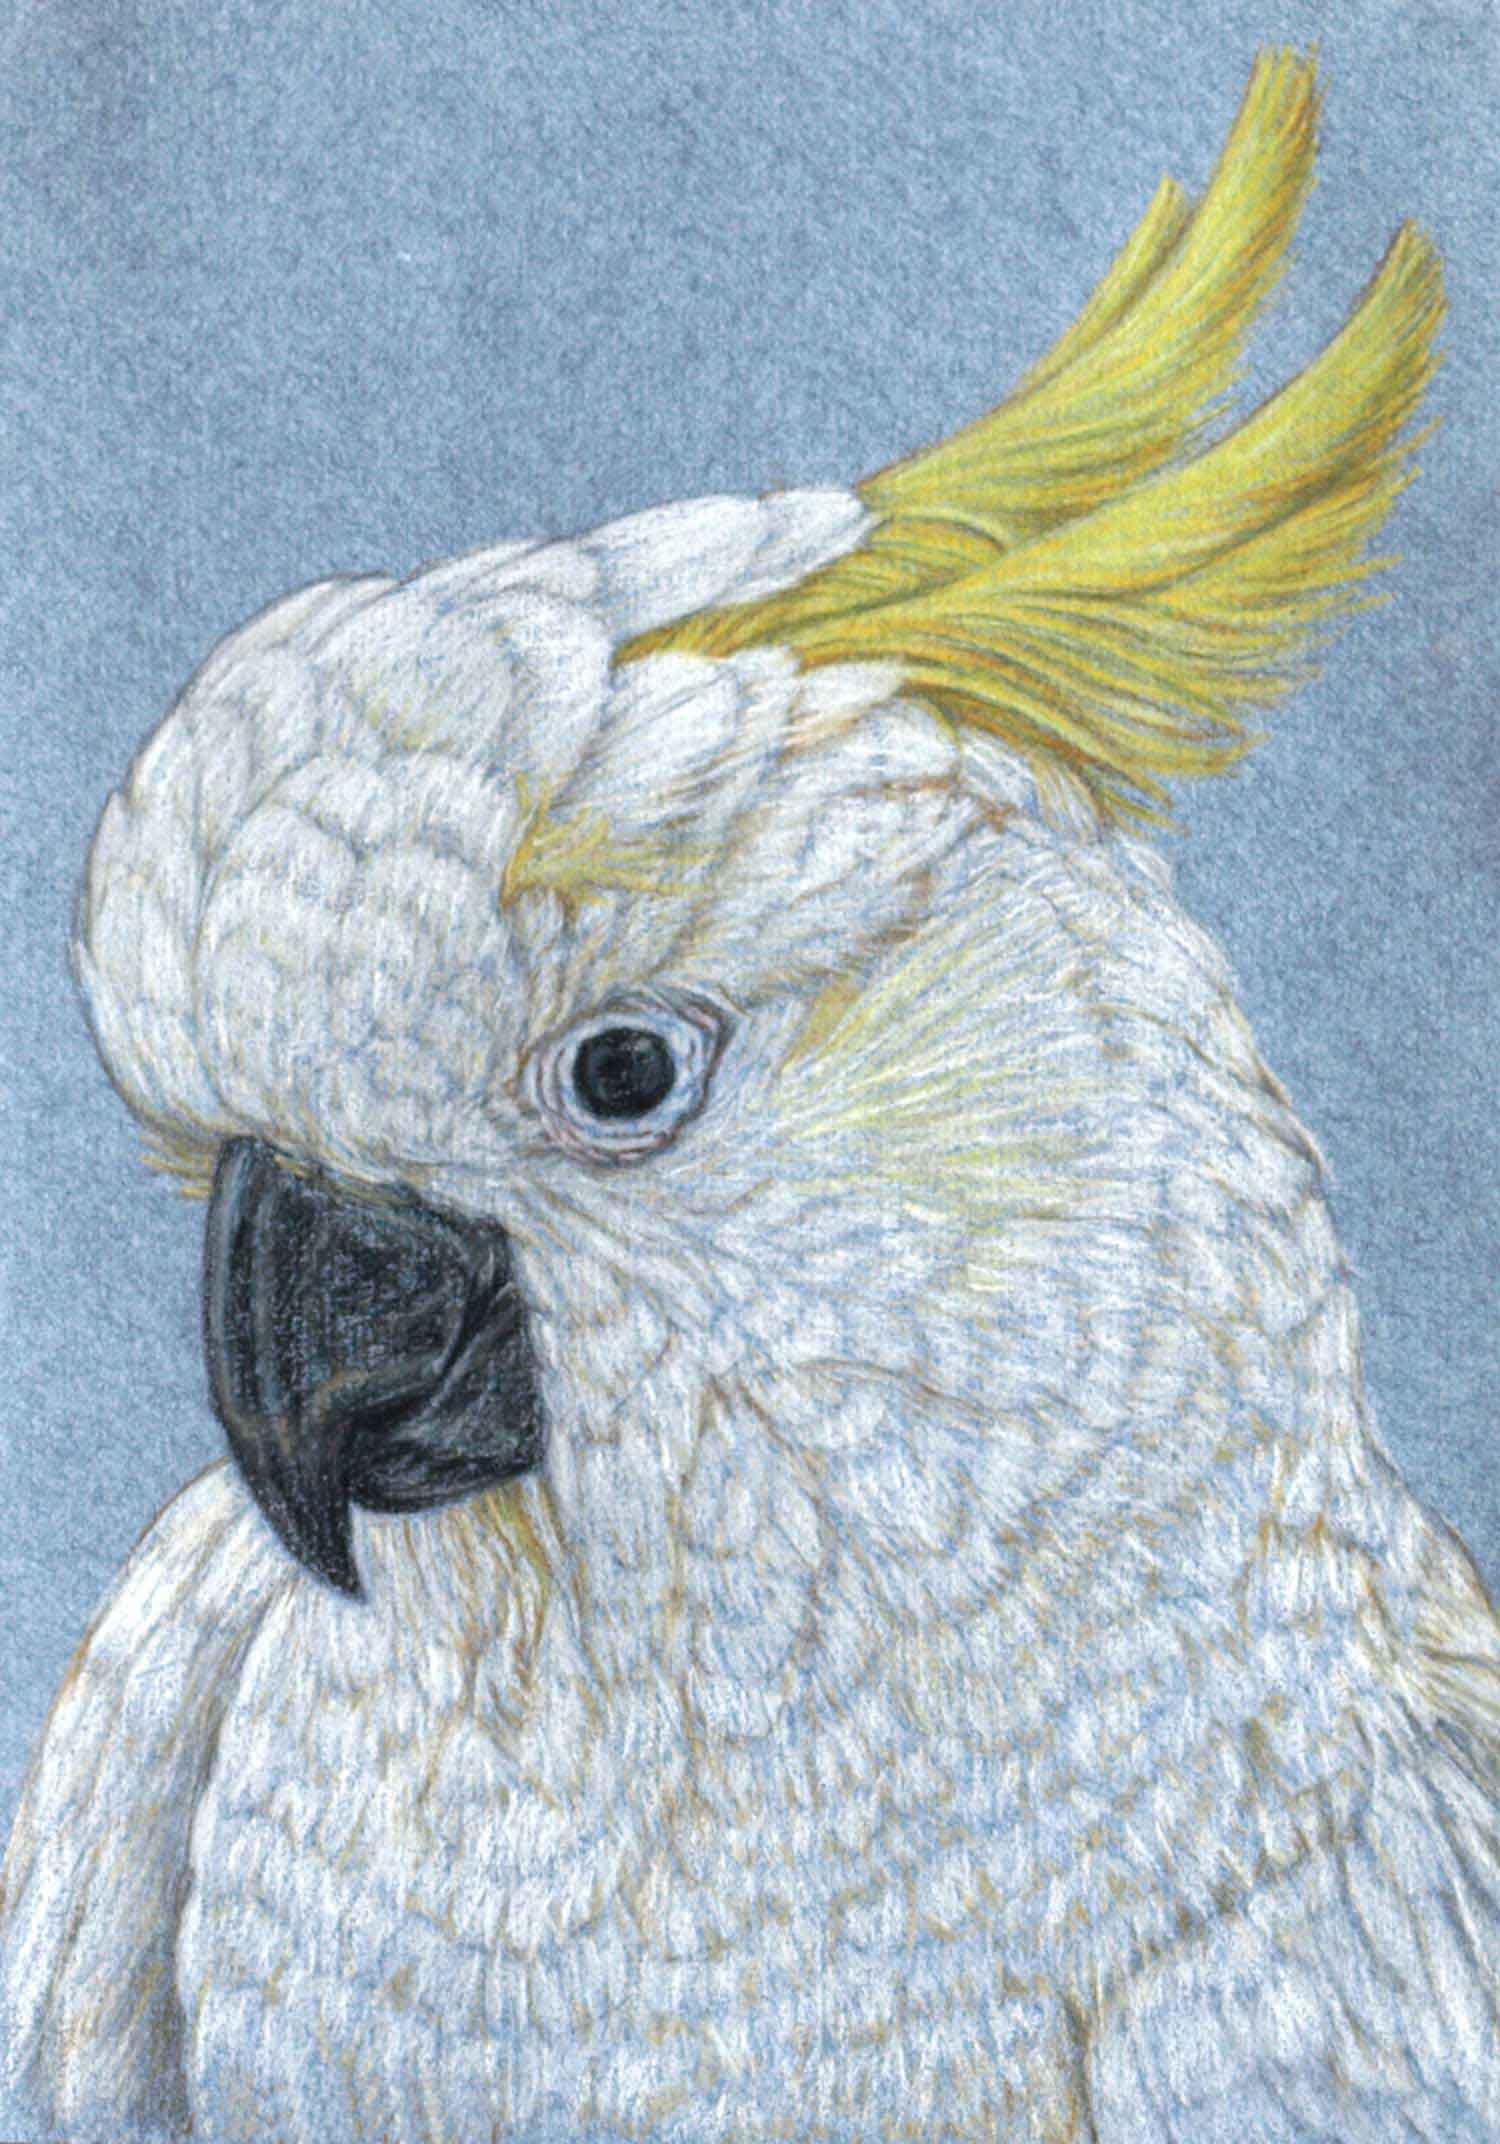 Sulphur Crested Cockatoo II 30 x 21 cm  Pastel on handmade paper  SOLD